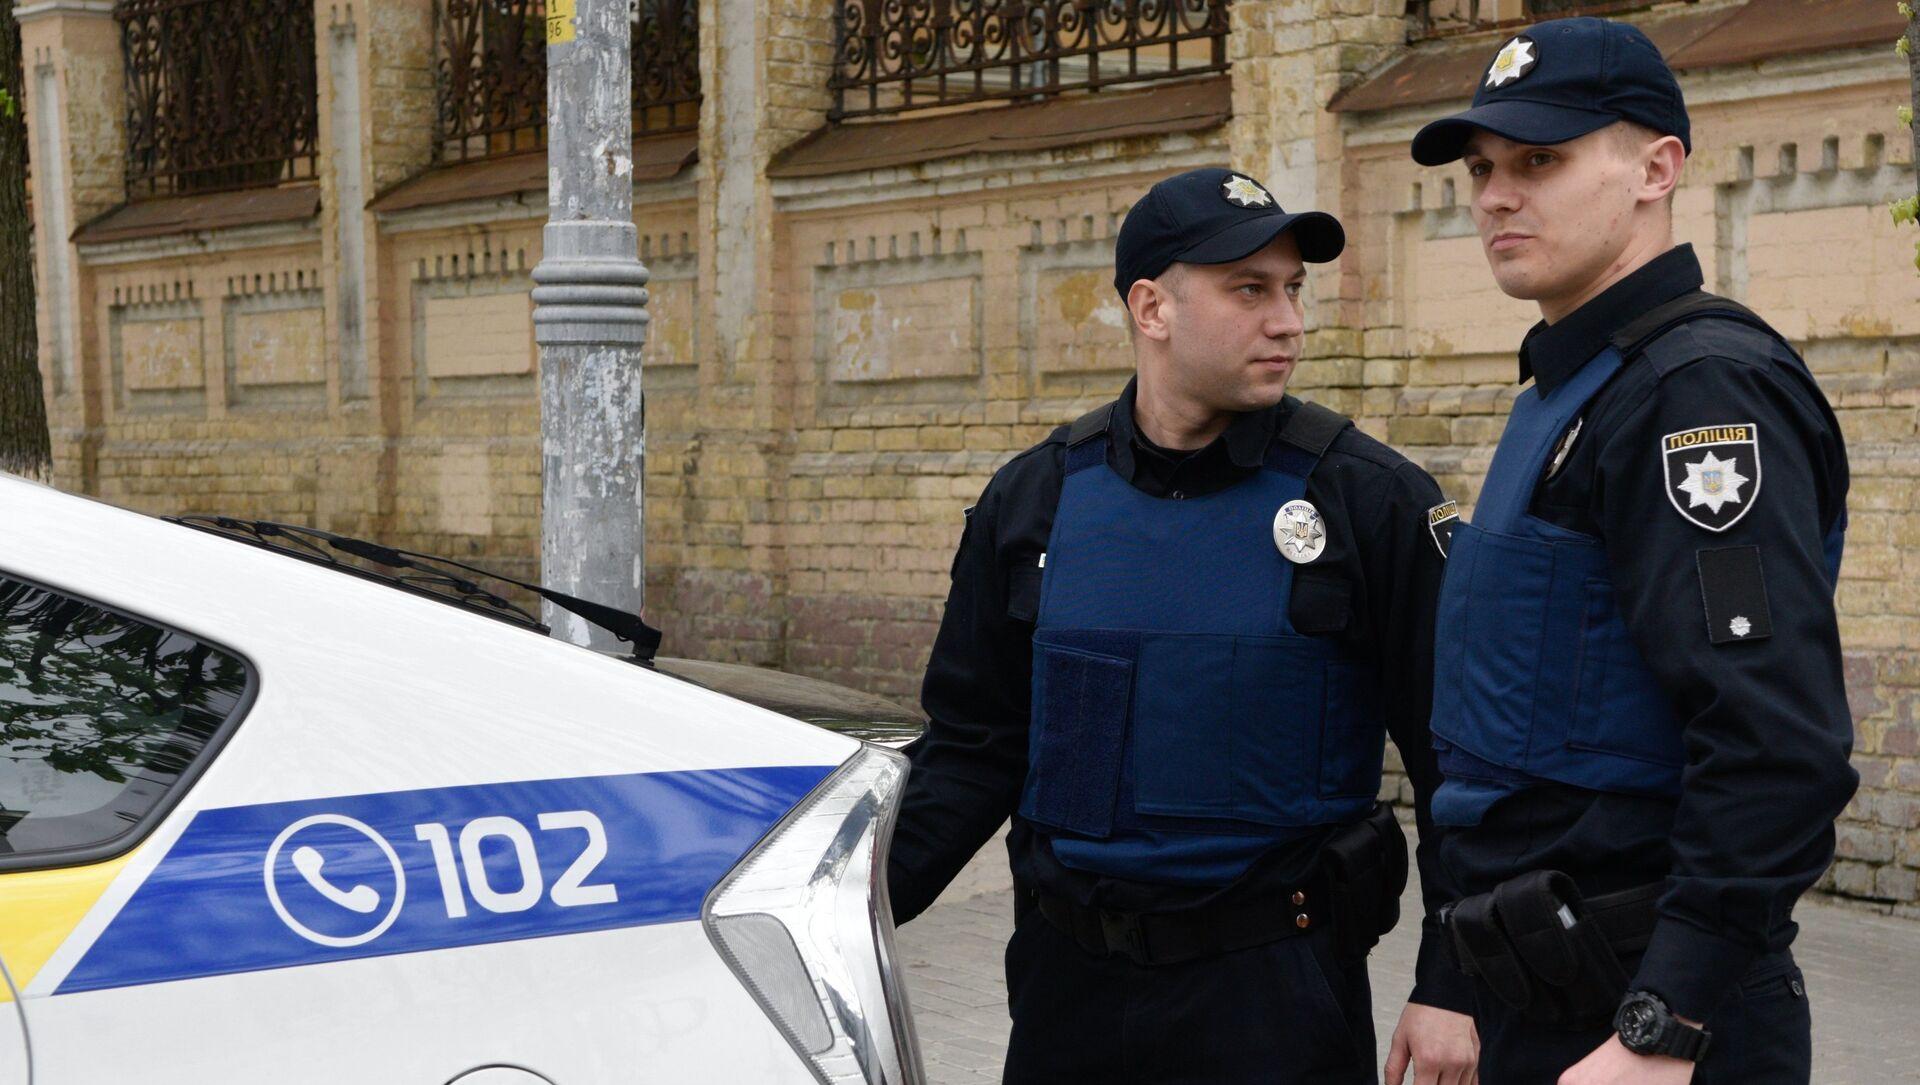 Ukrayna polisi - Sputnik Türkiye, 1920, 11.05.2021